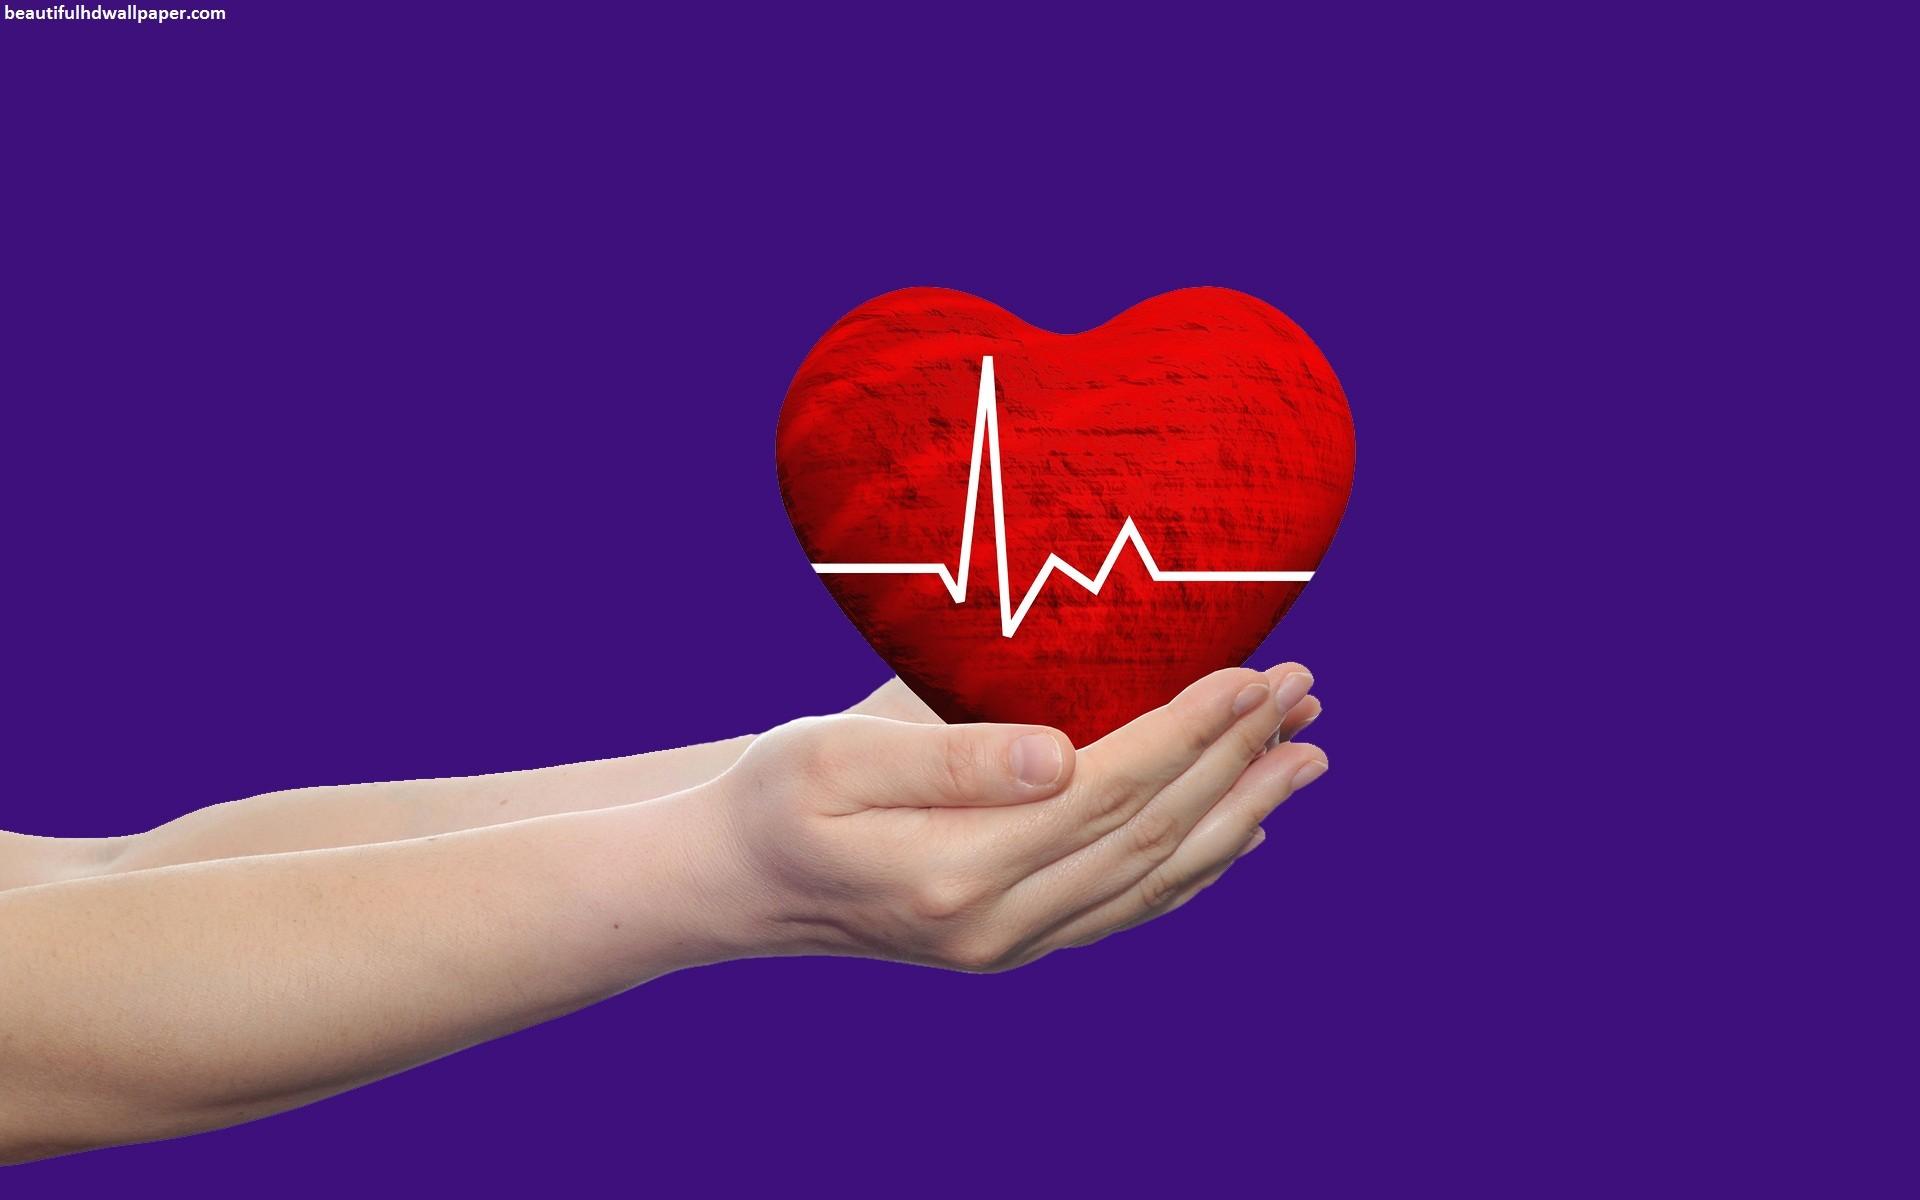 1920x1200, Broken Heart Care Love Wallpaper Beautiful - Love Hd Wallpaper Broken Heart - HD Wallpaper